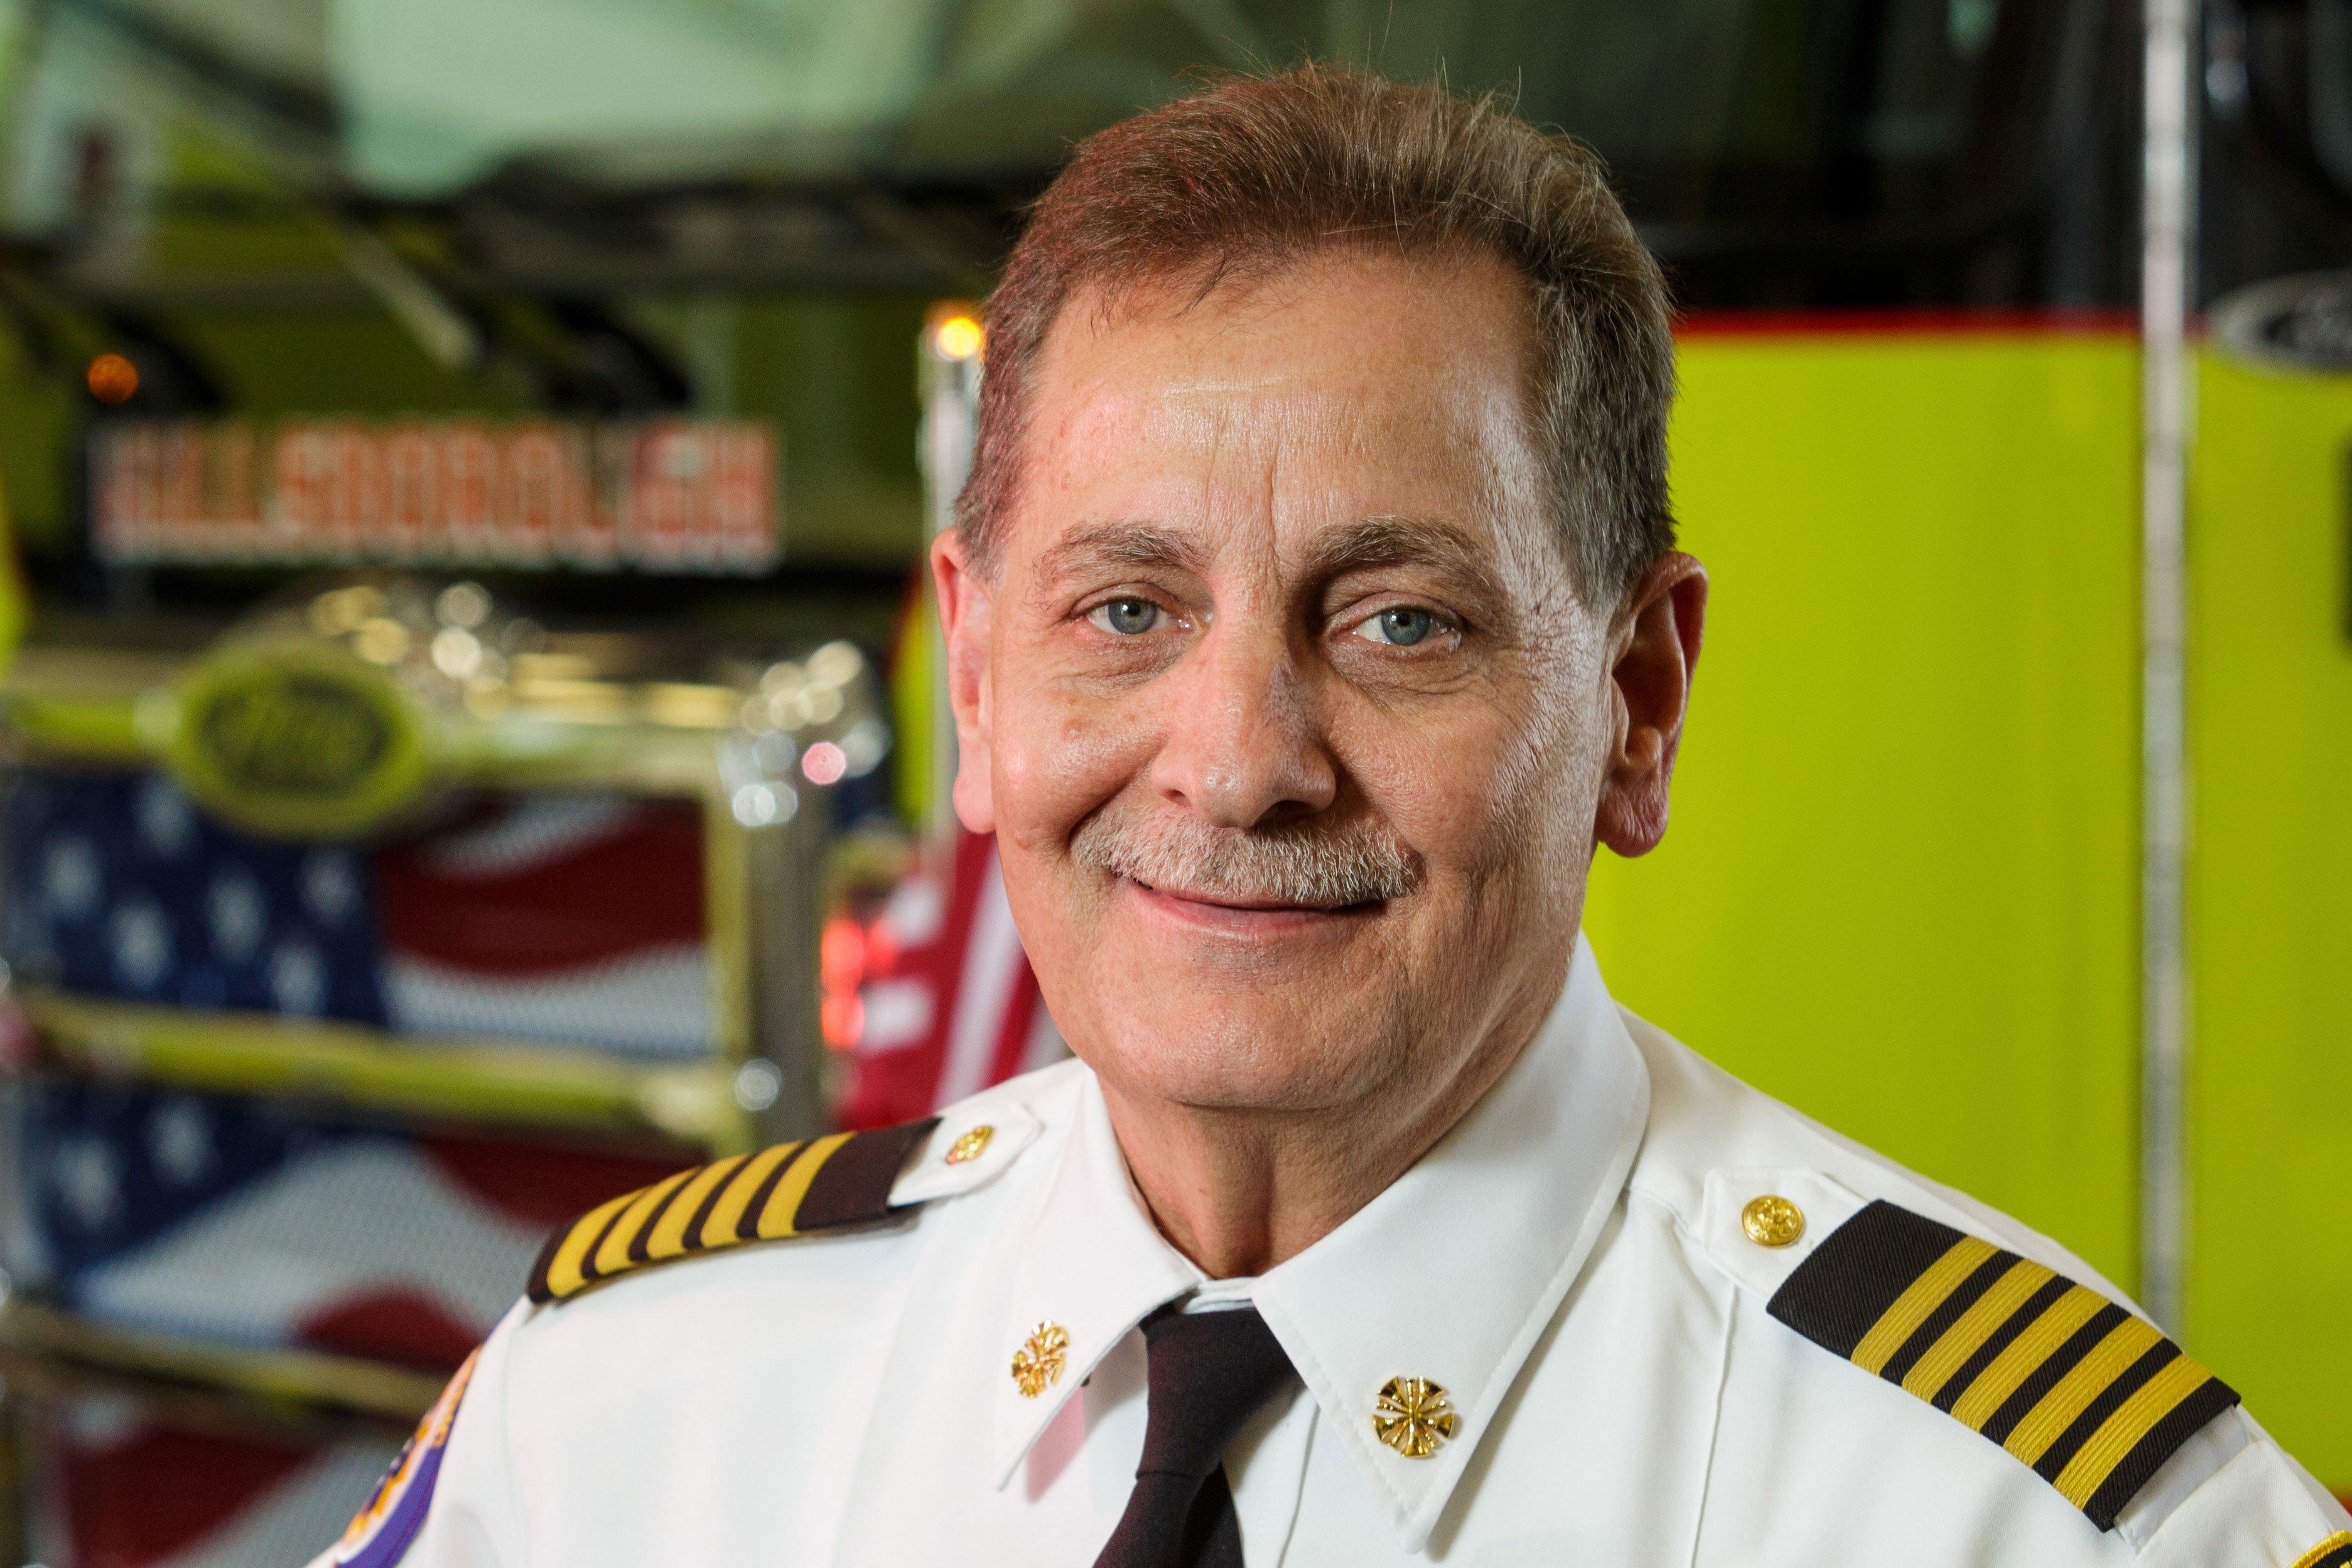 Hillsborough County Fire Rescue Chief Dennis Jones